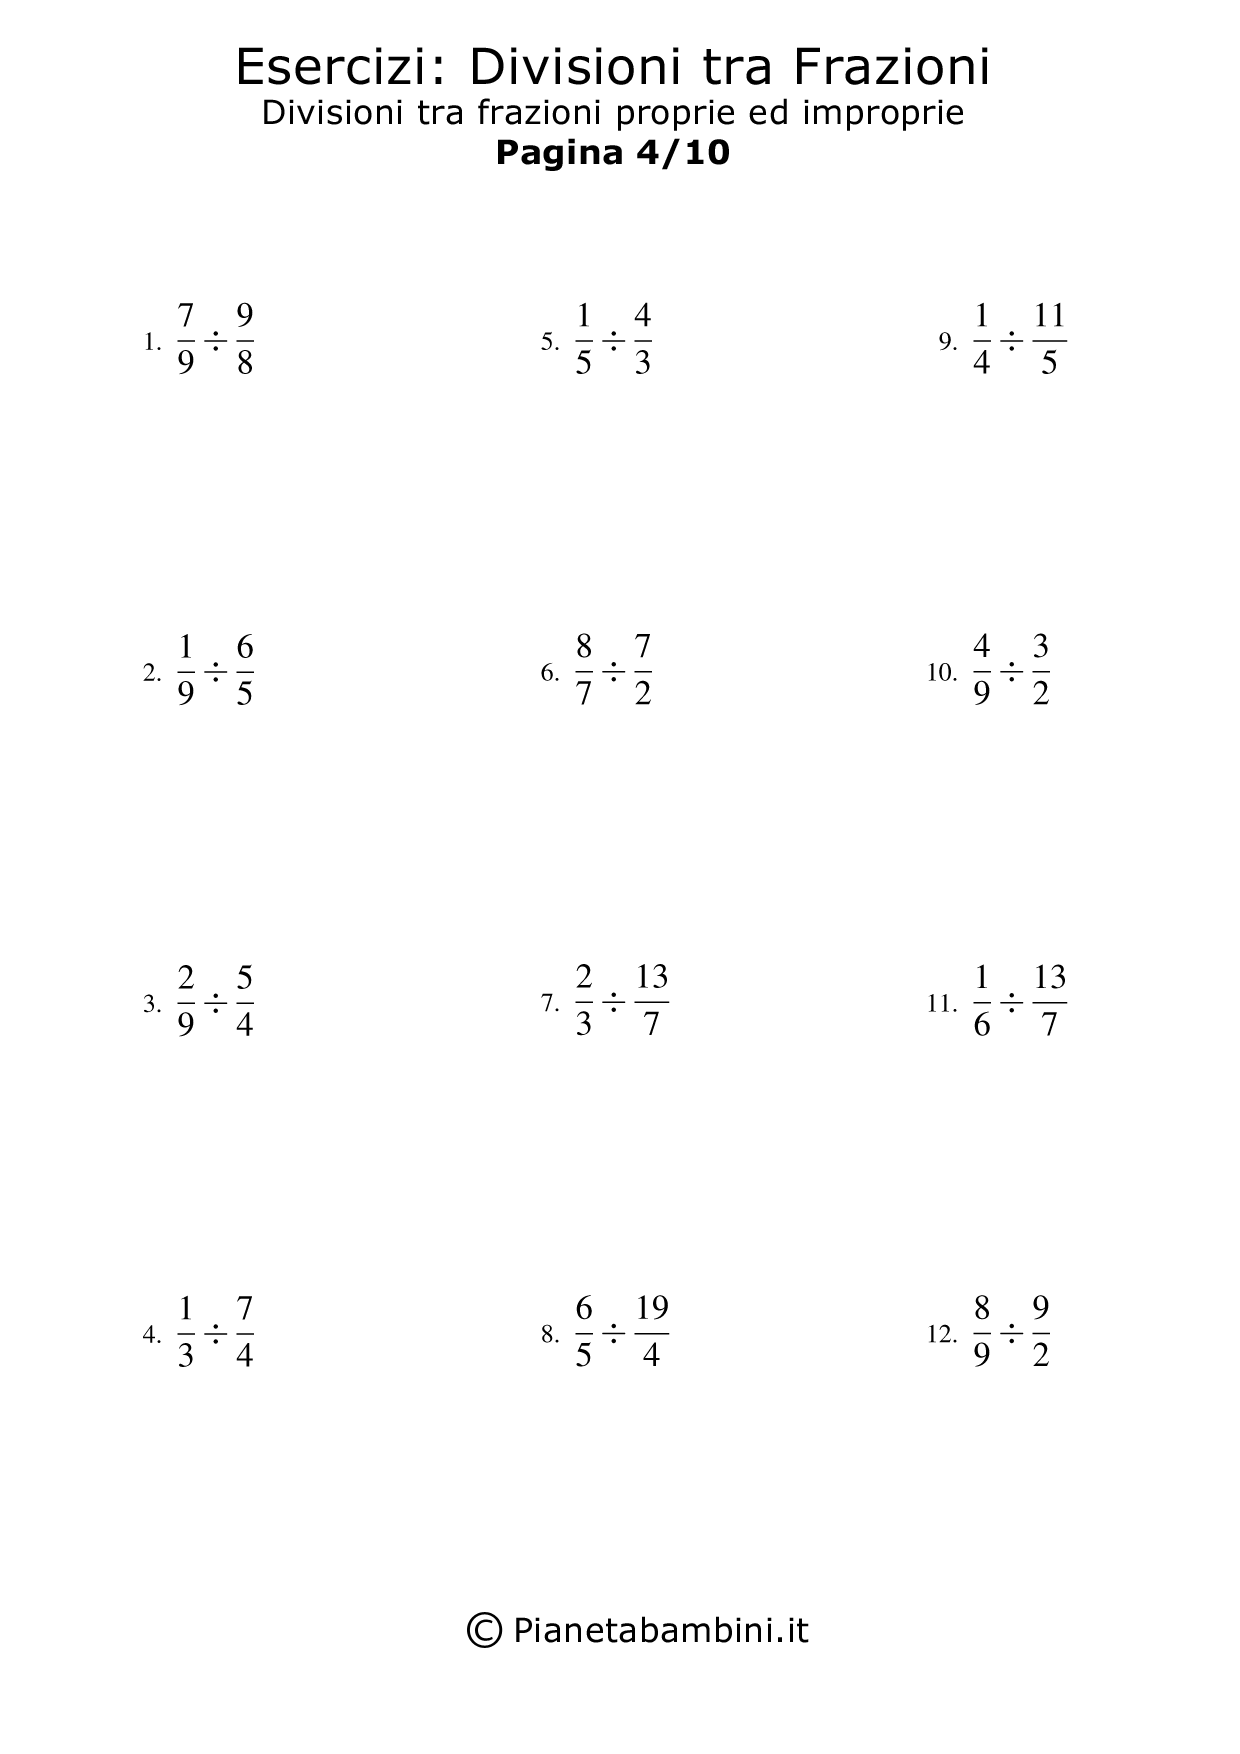 Esercizi-Divisioni-Frazioni-Proprie-Improprie_04